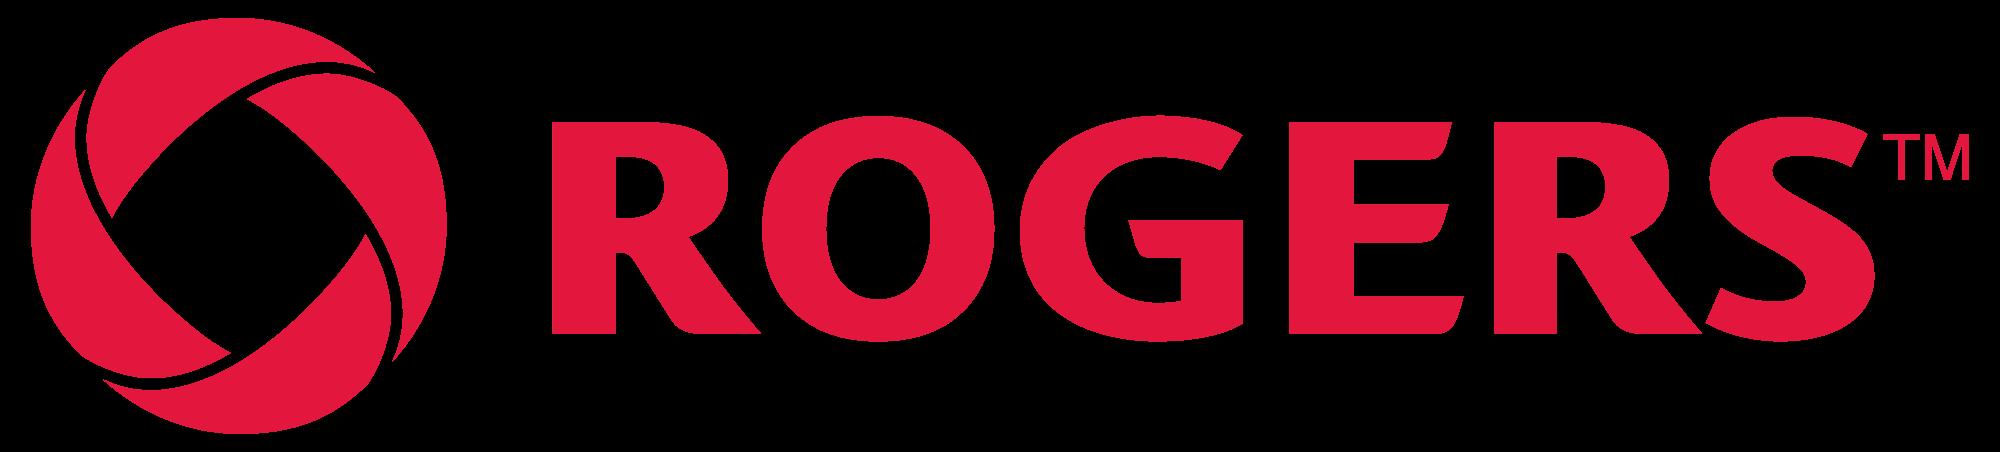 Rogers_logo.svg